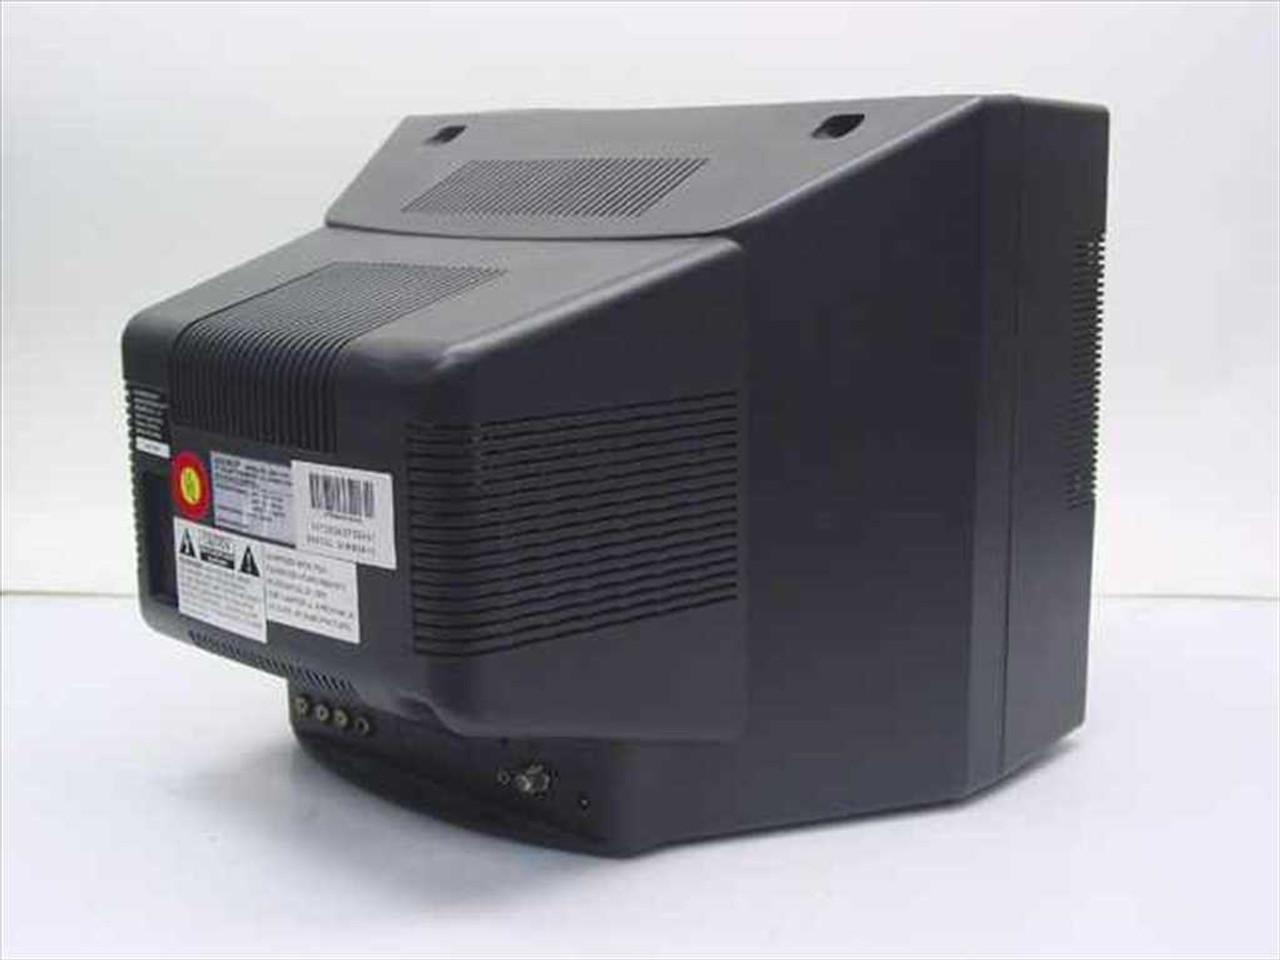 audiovox avt 1475 13 color tv monitor dc powered  [ 1280 x 960 Pixel ]